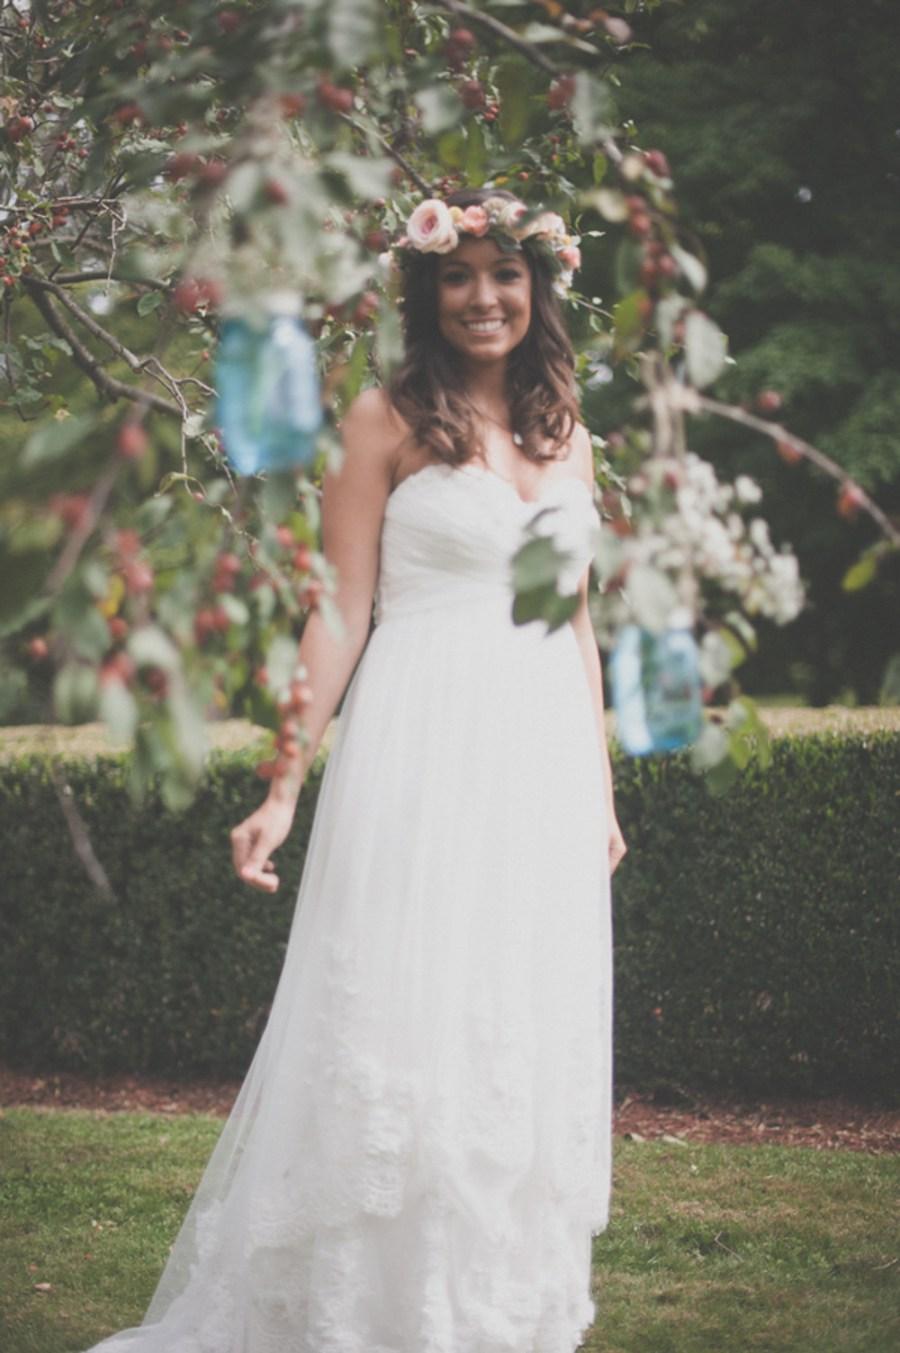 Boho Chic Wedding by Yvonne Goll Photography